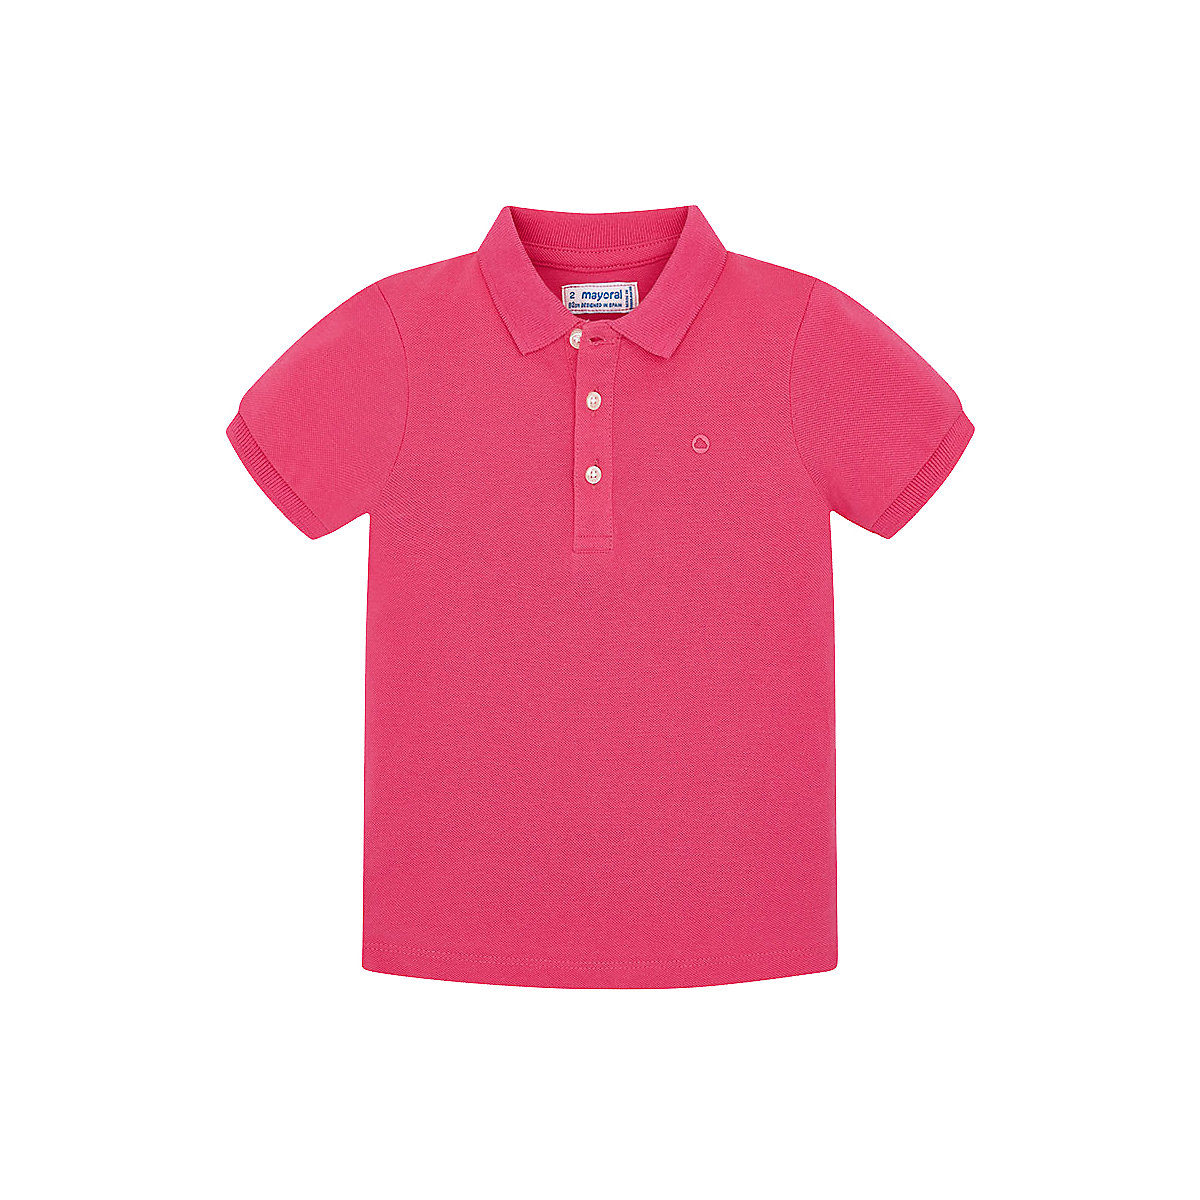 MAYORAL Polo Shirts 10683011 children clothing t-shirt shirt the print for boys